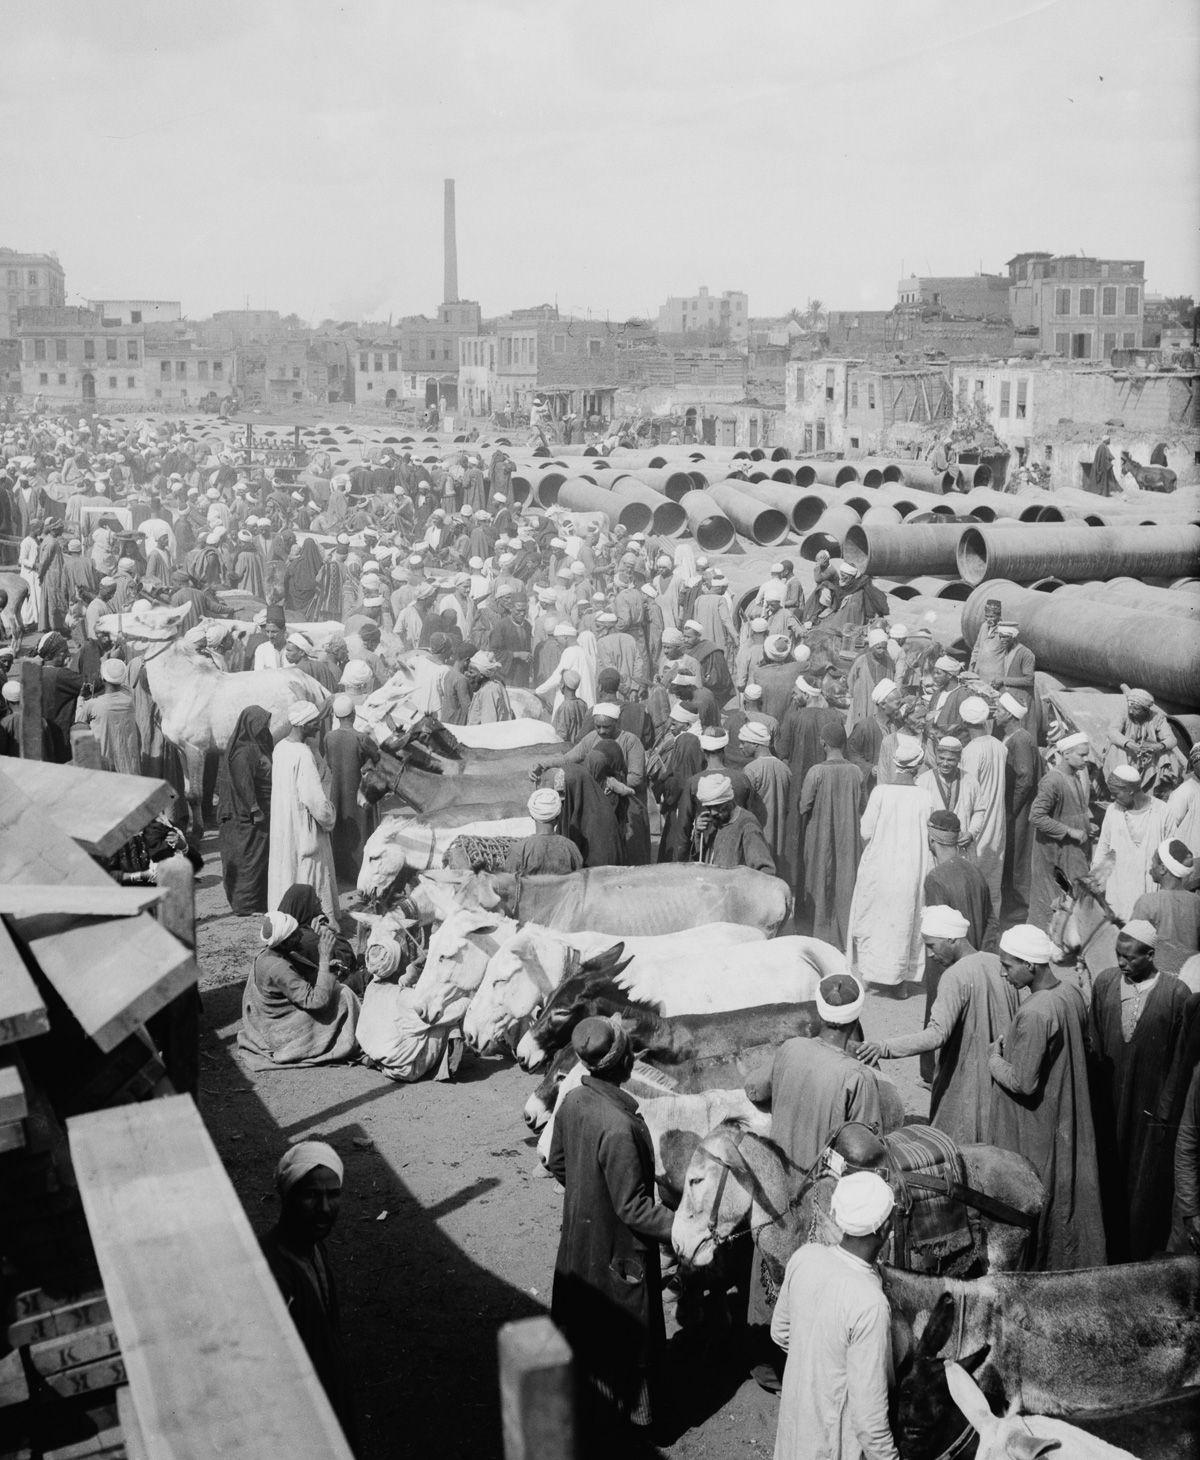 Istoricheskie fotografii Kaira 28